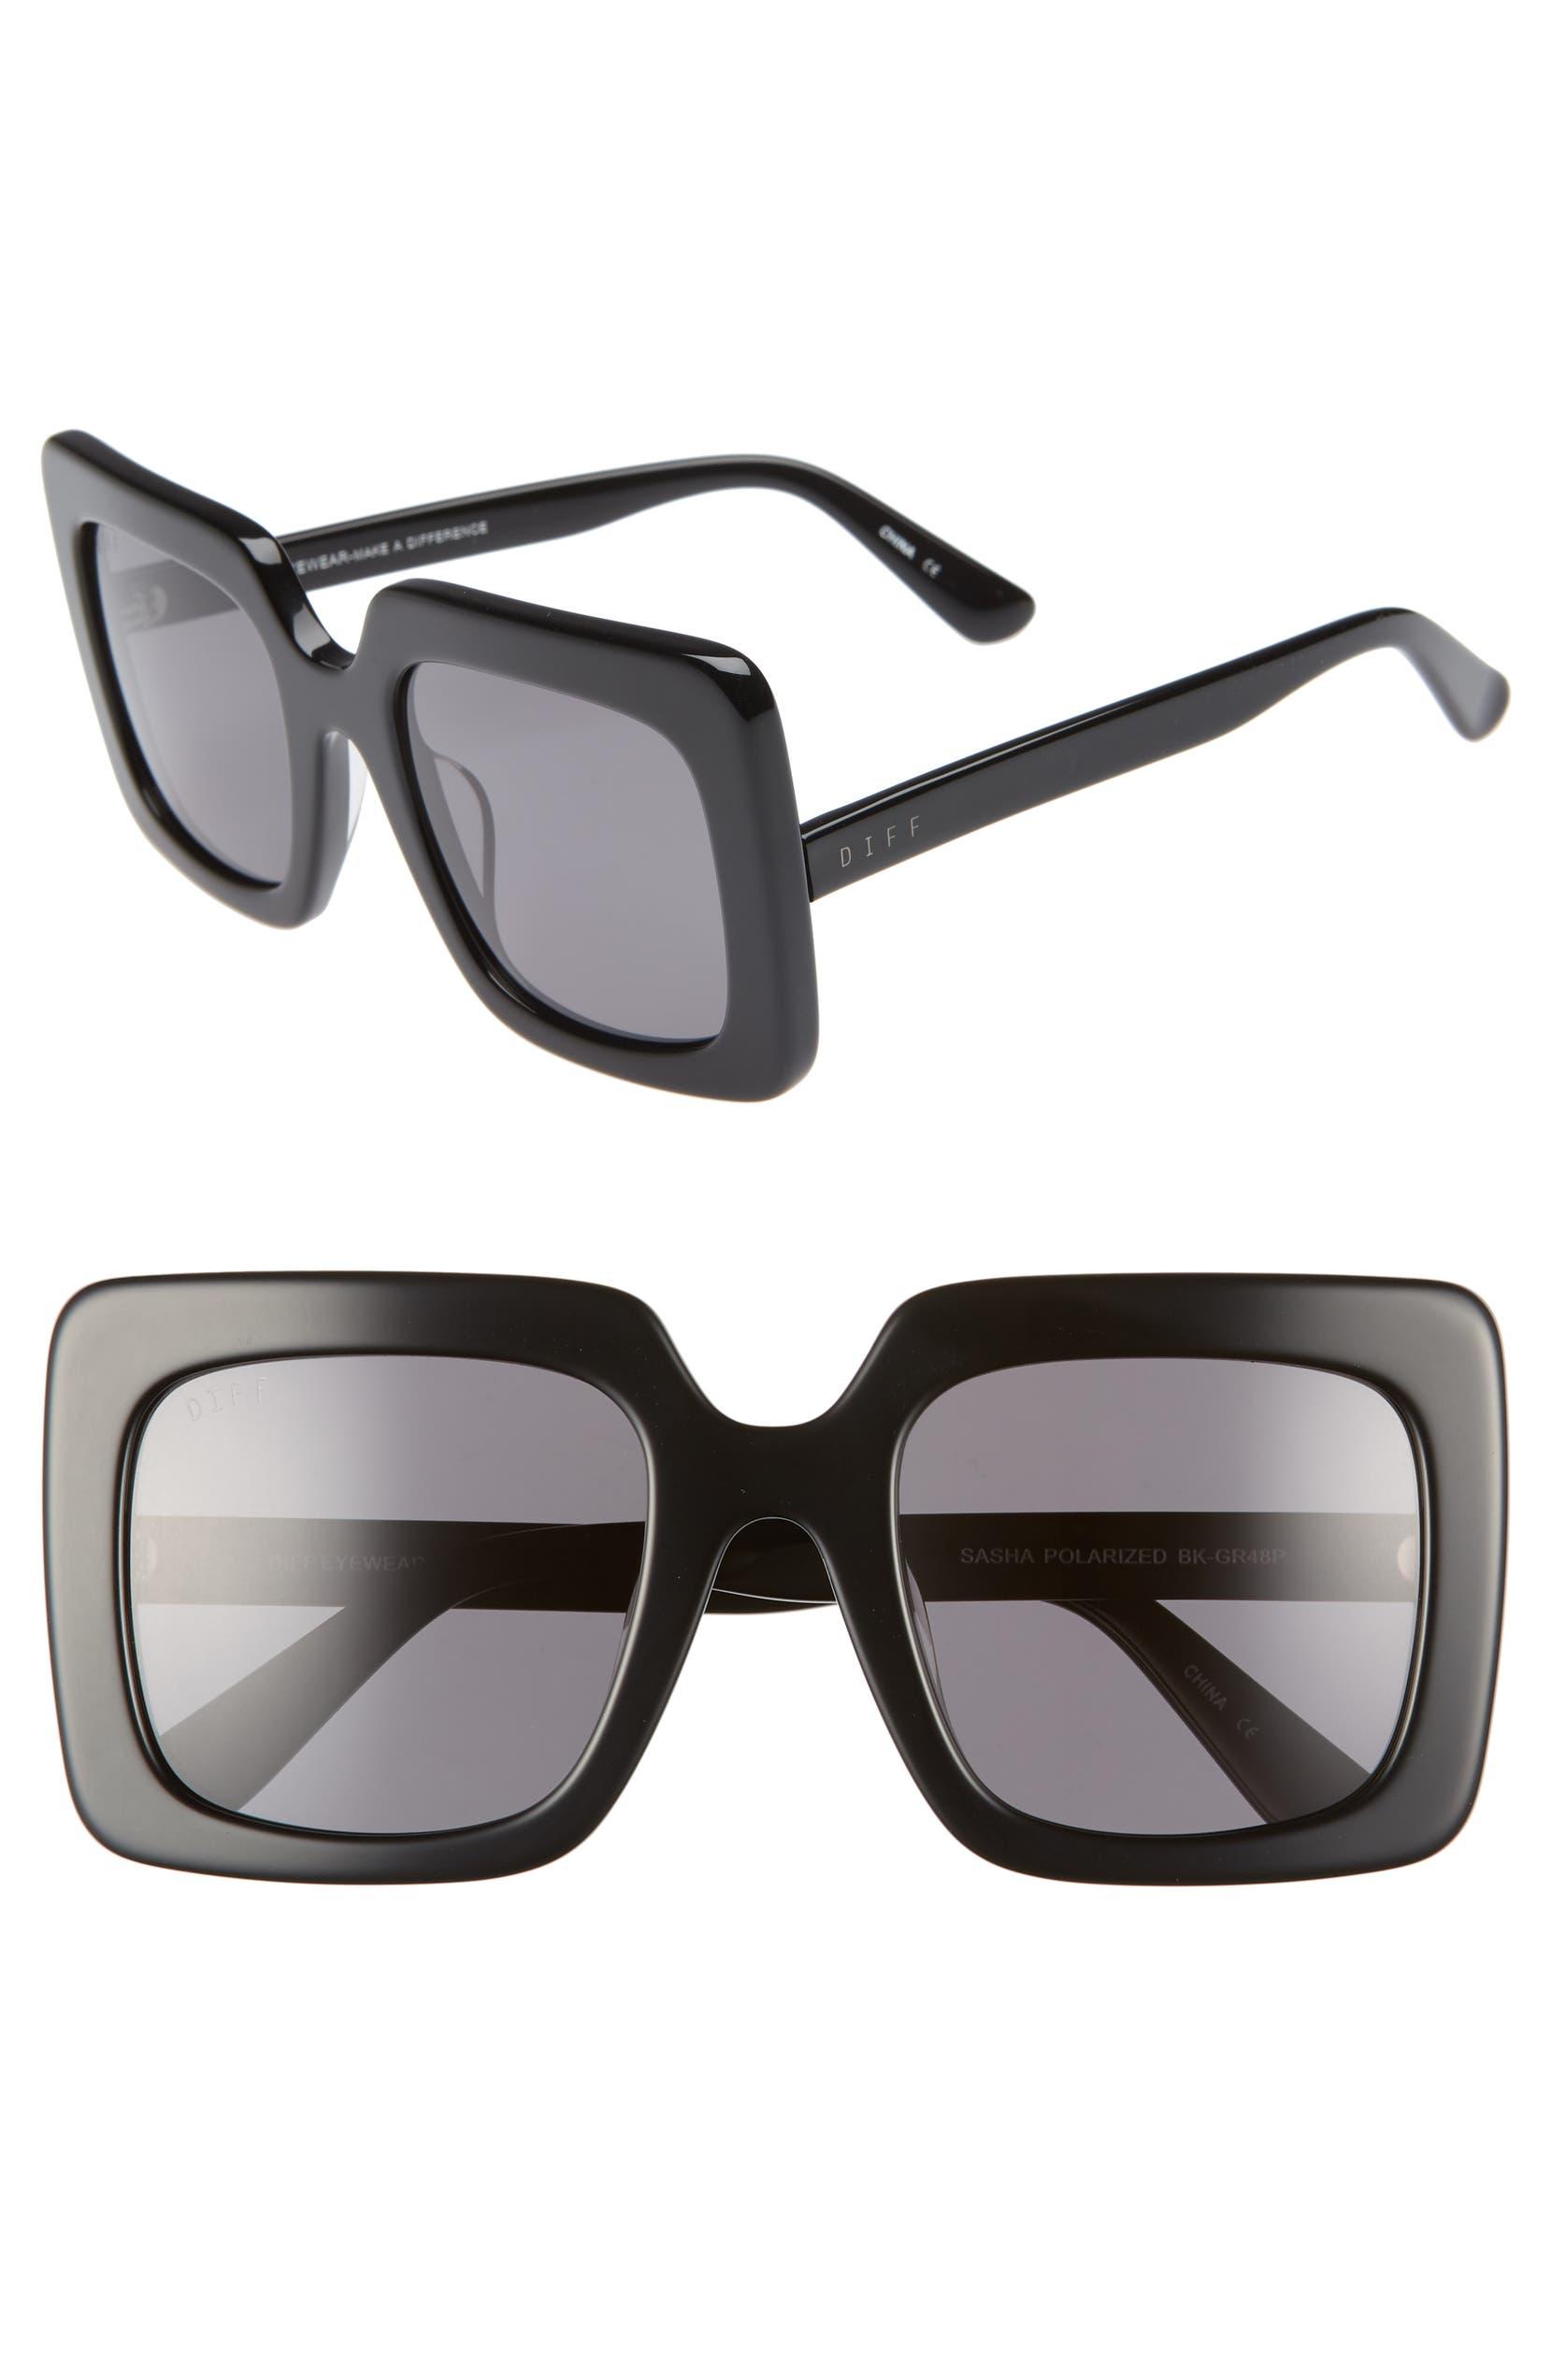 afbe2c6f4d DIFF Sasha 53mm Polarized Sunglasses